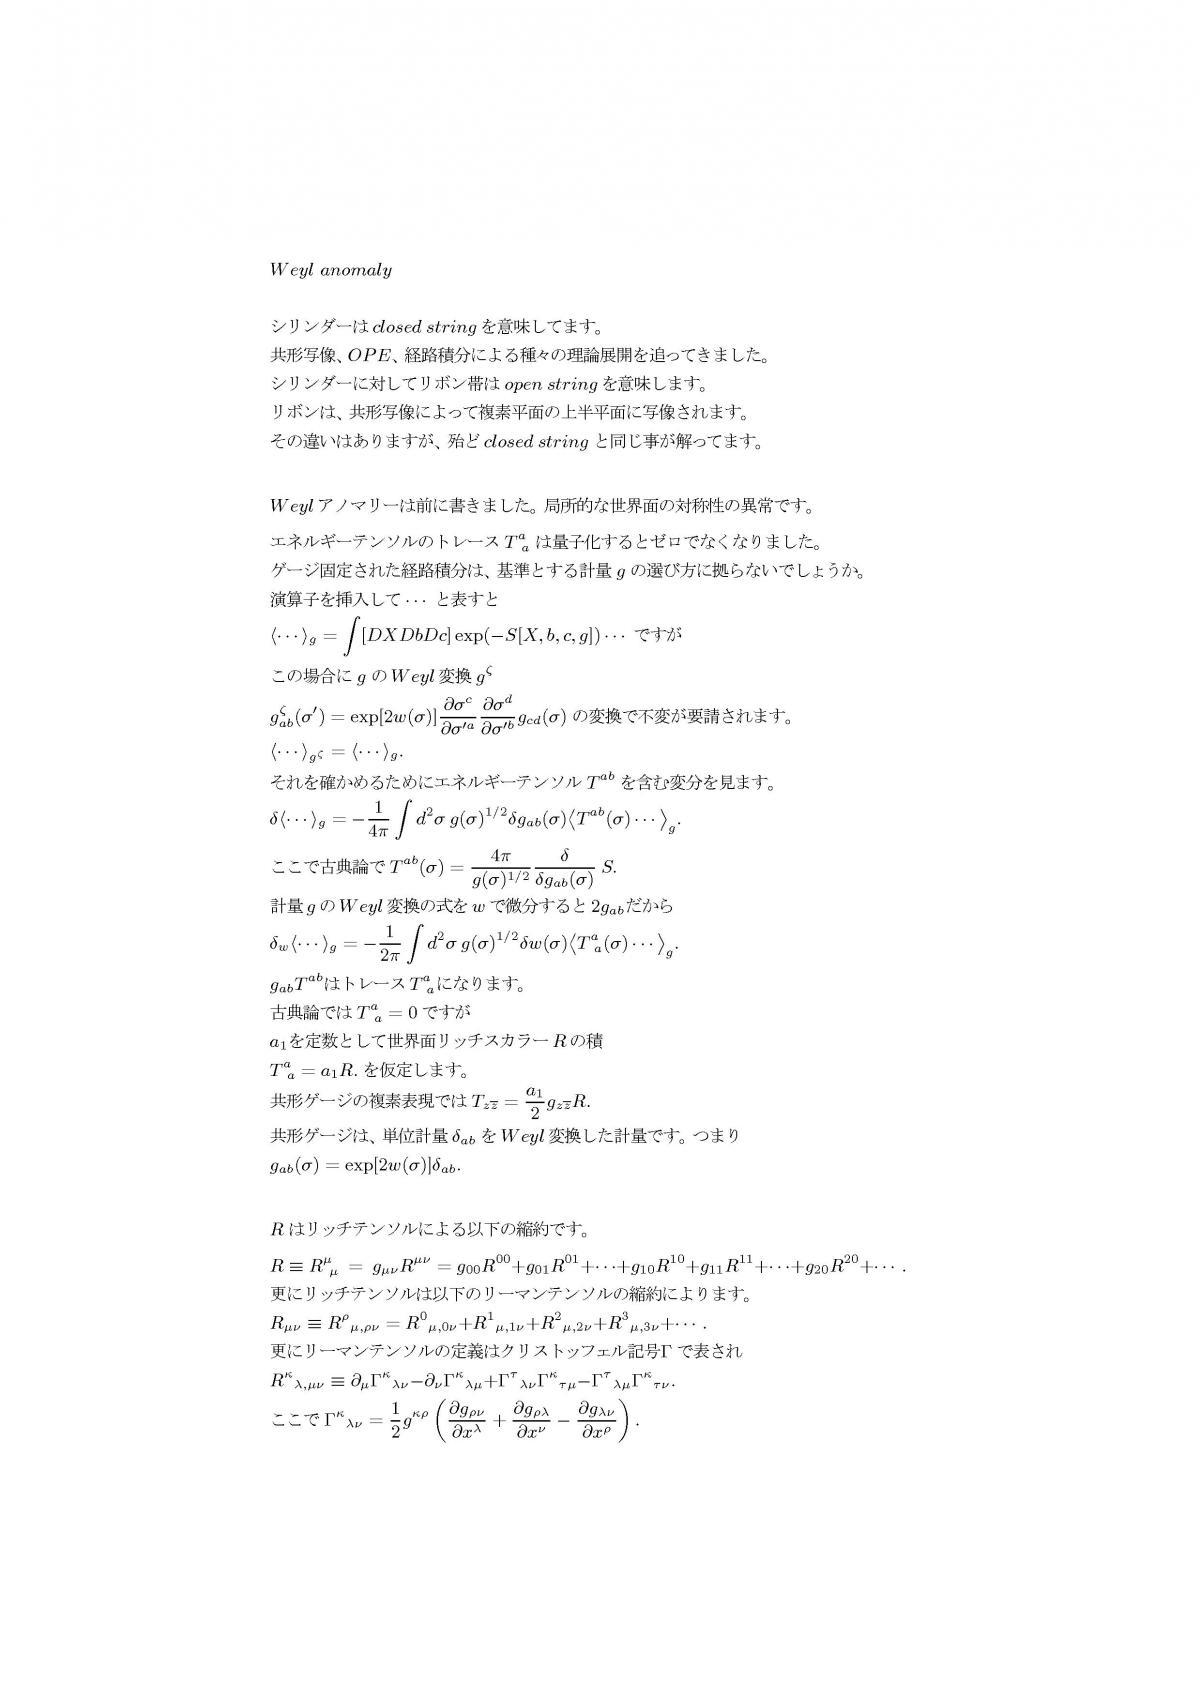 zgen46a.jpg